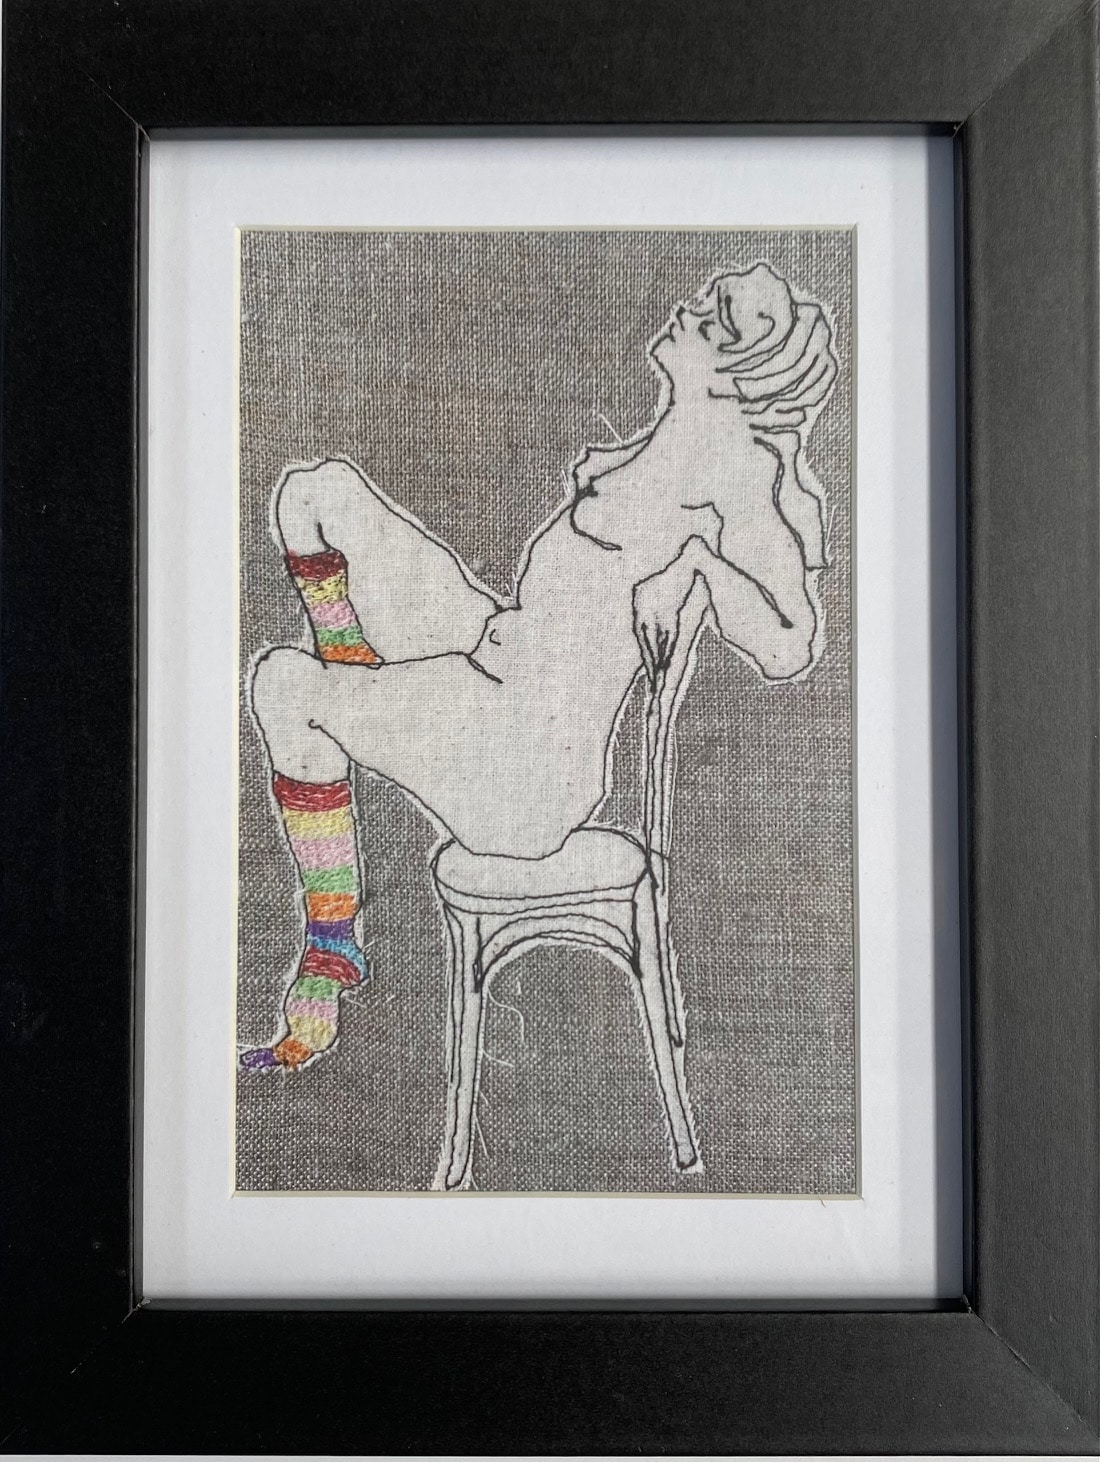 Ms Stripey Socks II Framed Artwork Print By Juliet D Collins